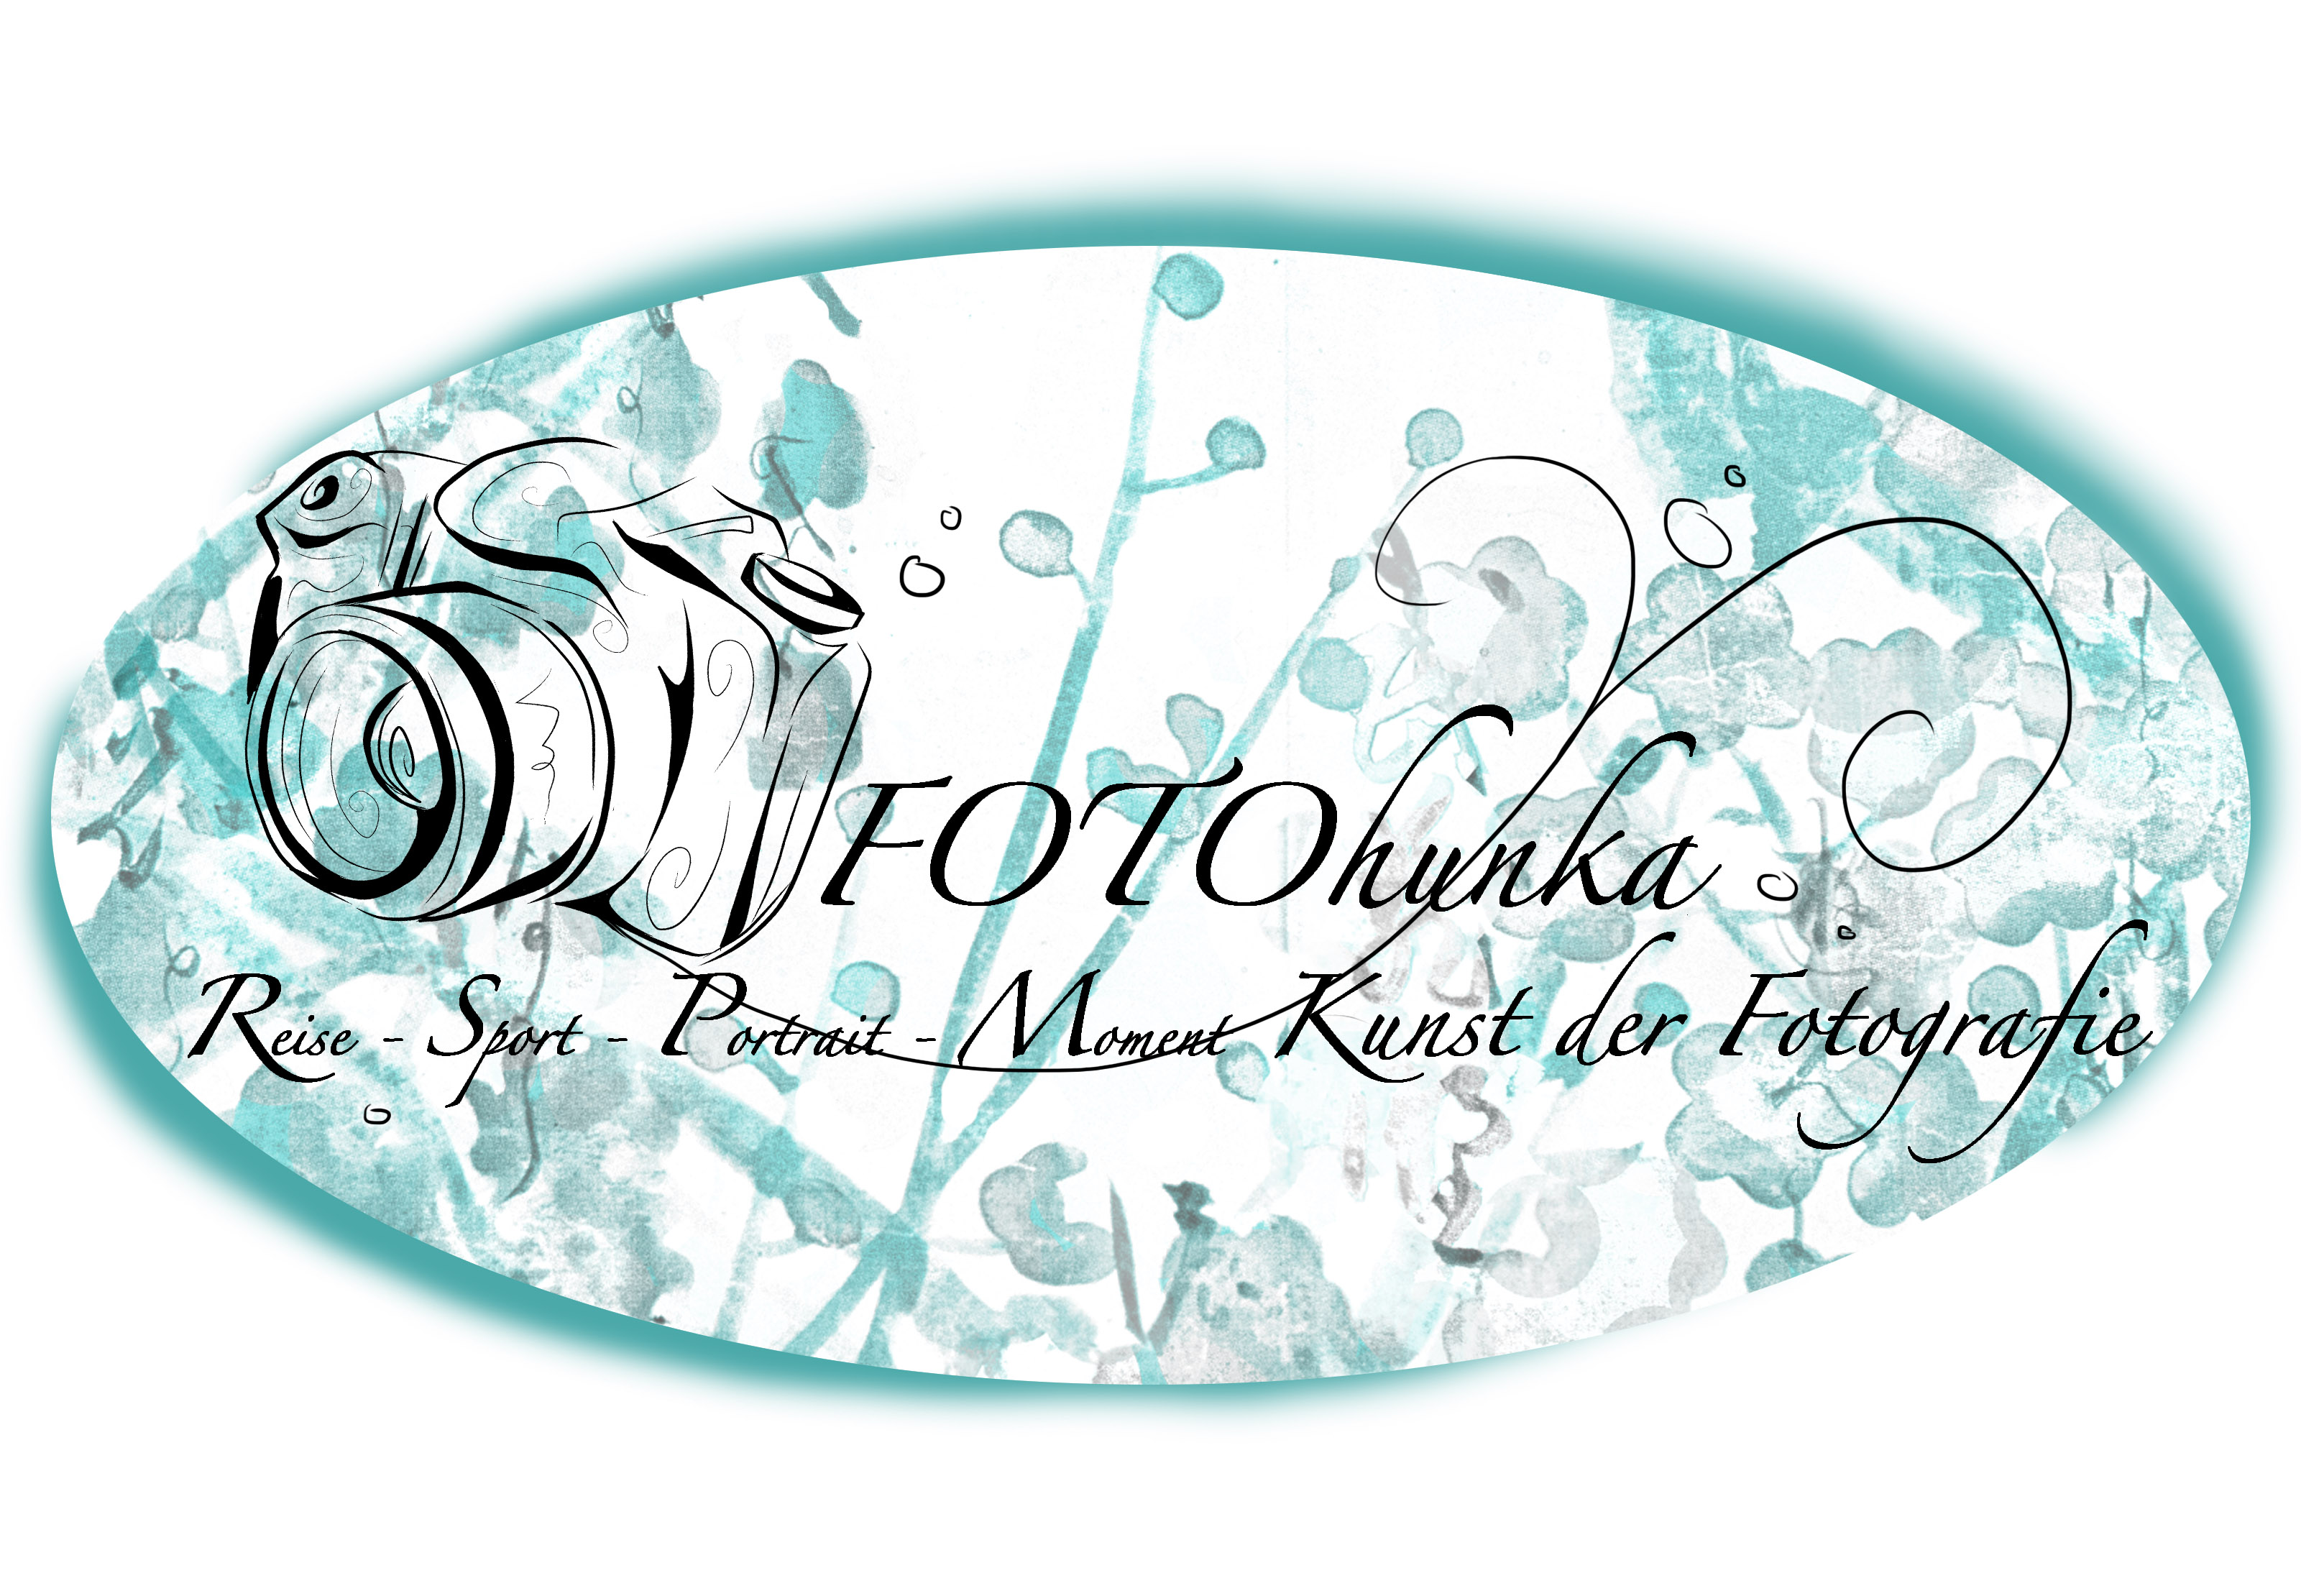 FOTOhunka logo